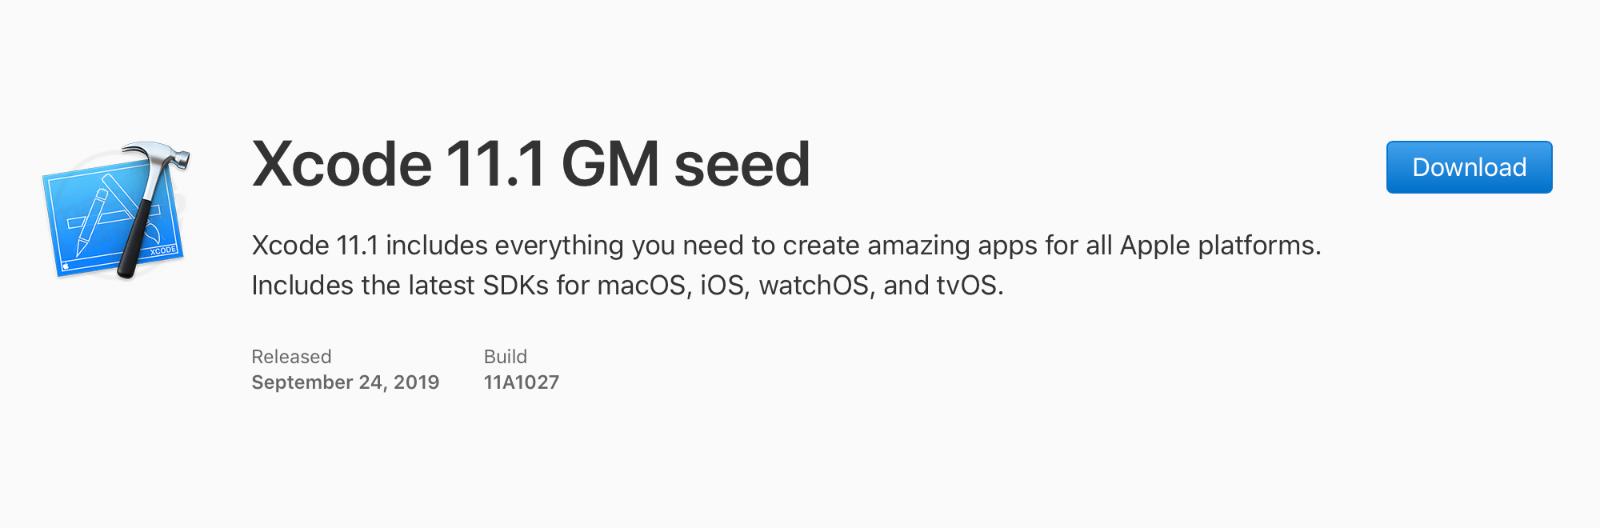 Xcode 11.1 GM